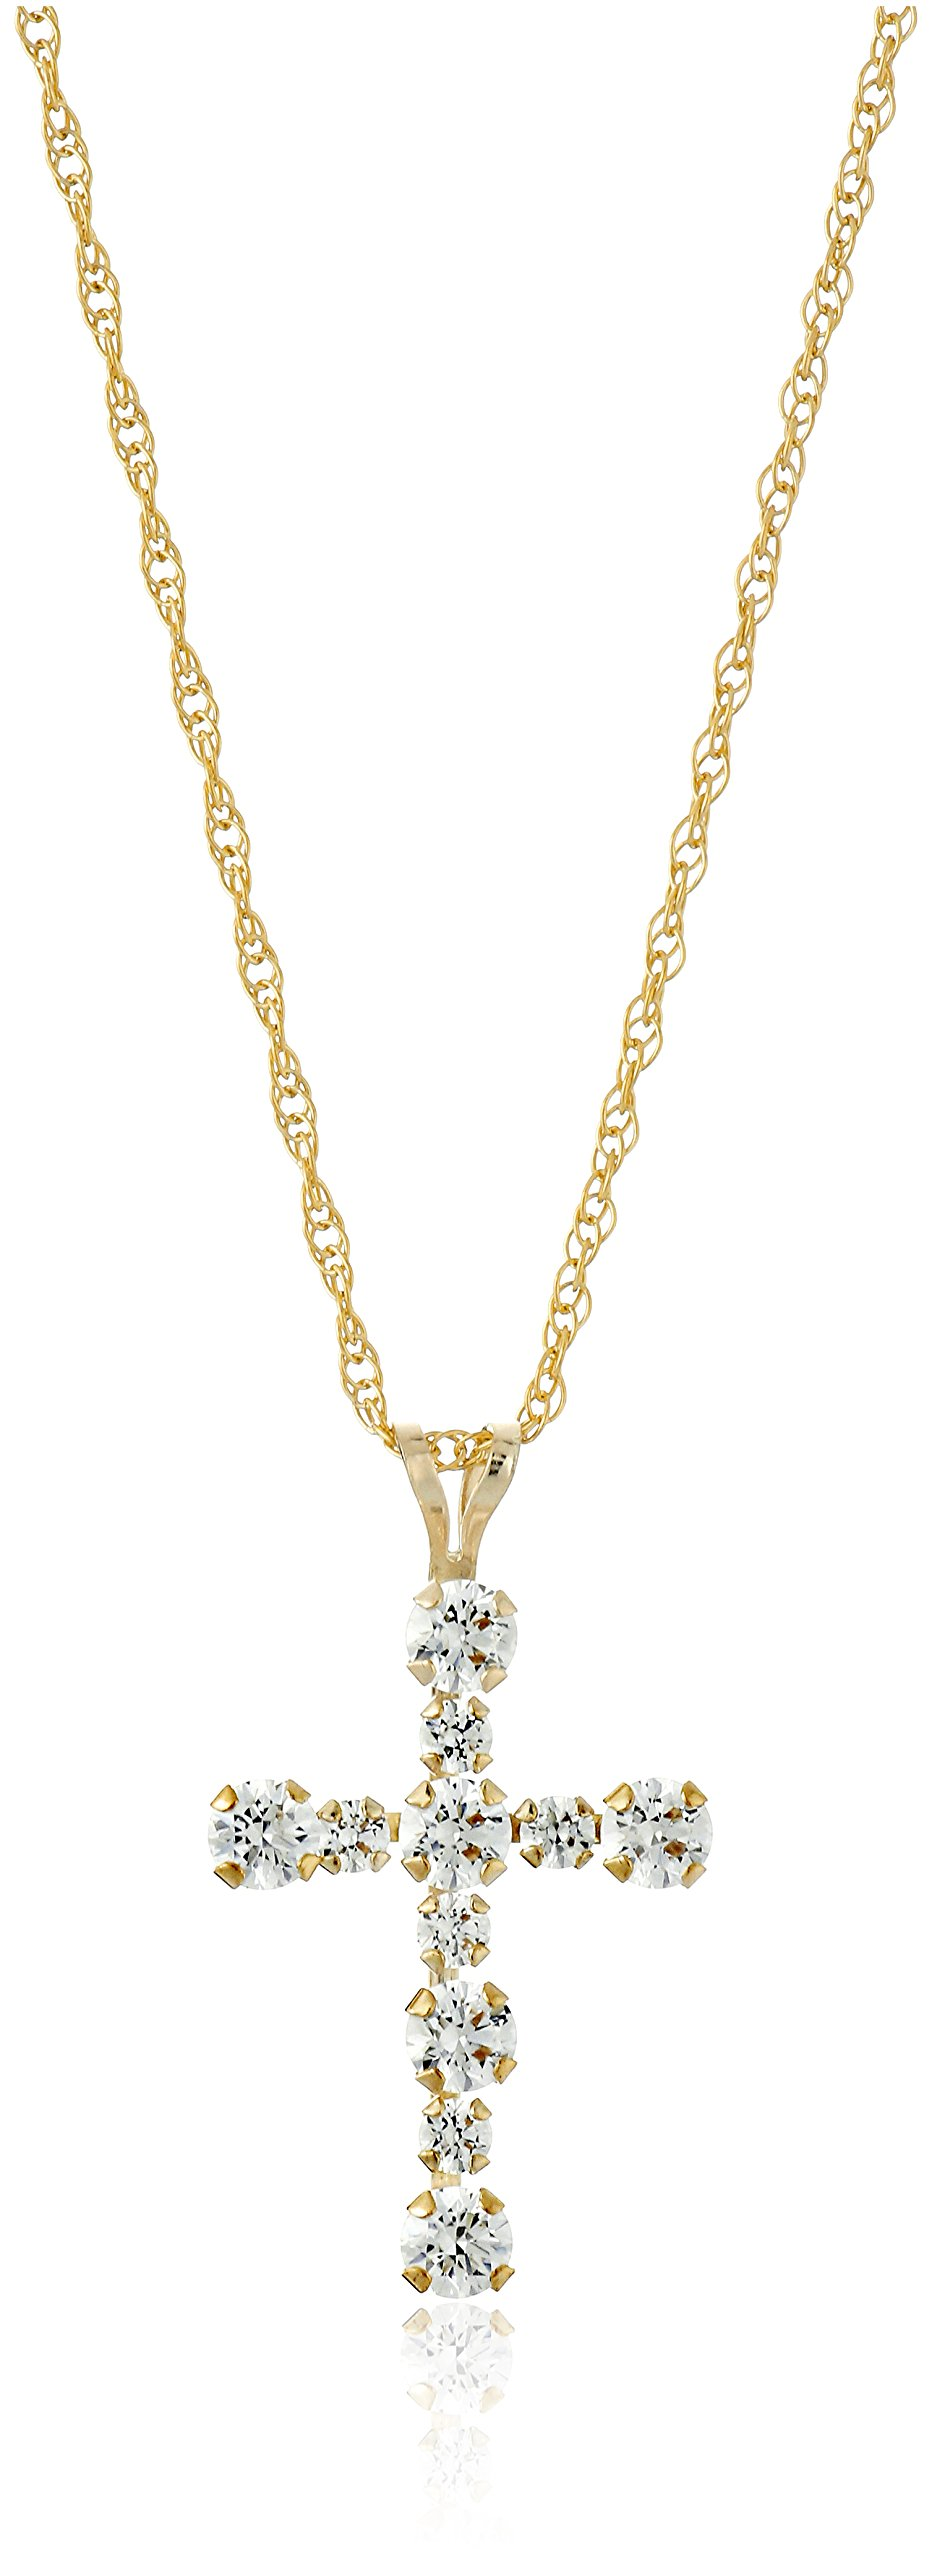 10K Yellow Gold Cross Pendant Necklace set with Swarovski Zirconia (.5 cttw), 18''